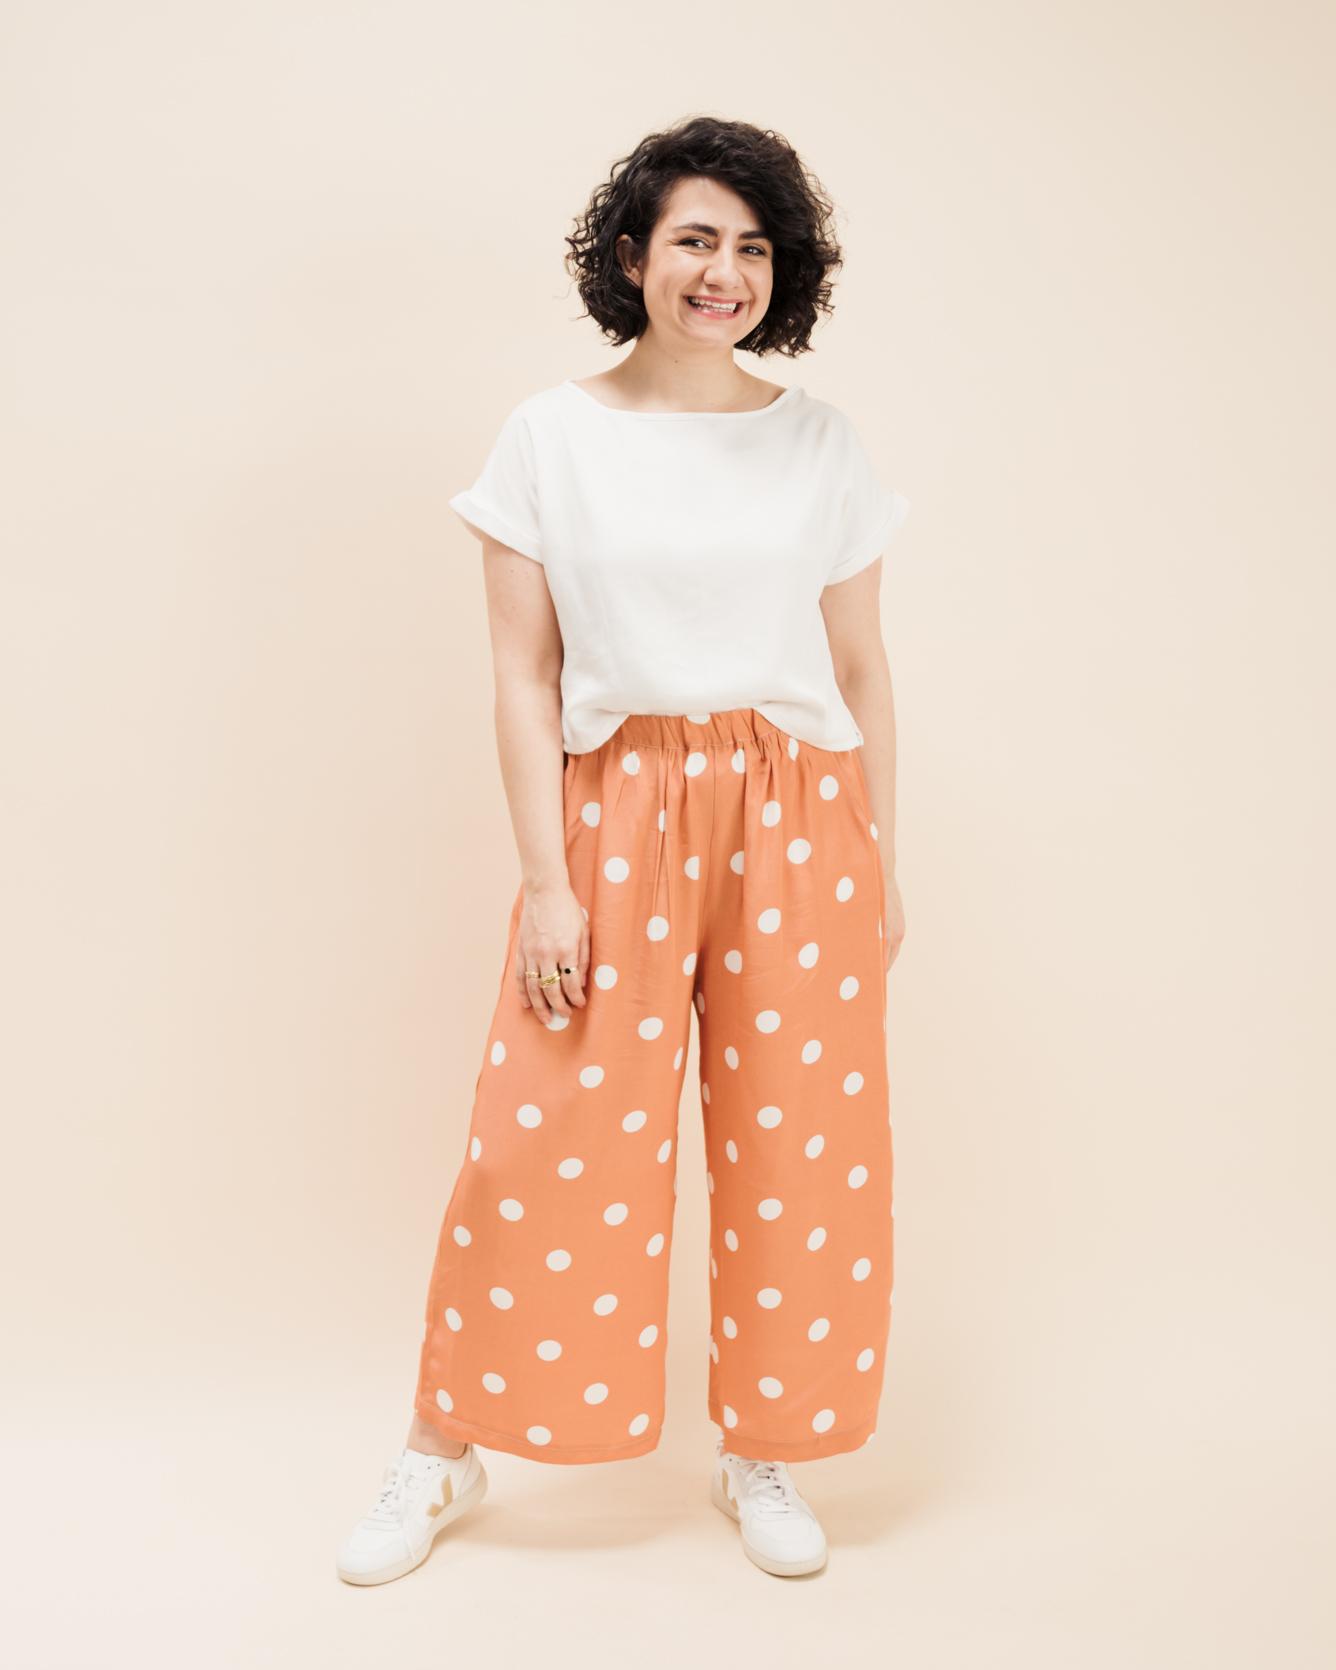 Schnittmuster Culotte und Blusenshirt Bloom - Culotte nähen - Schnittduett